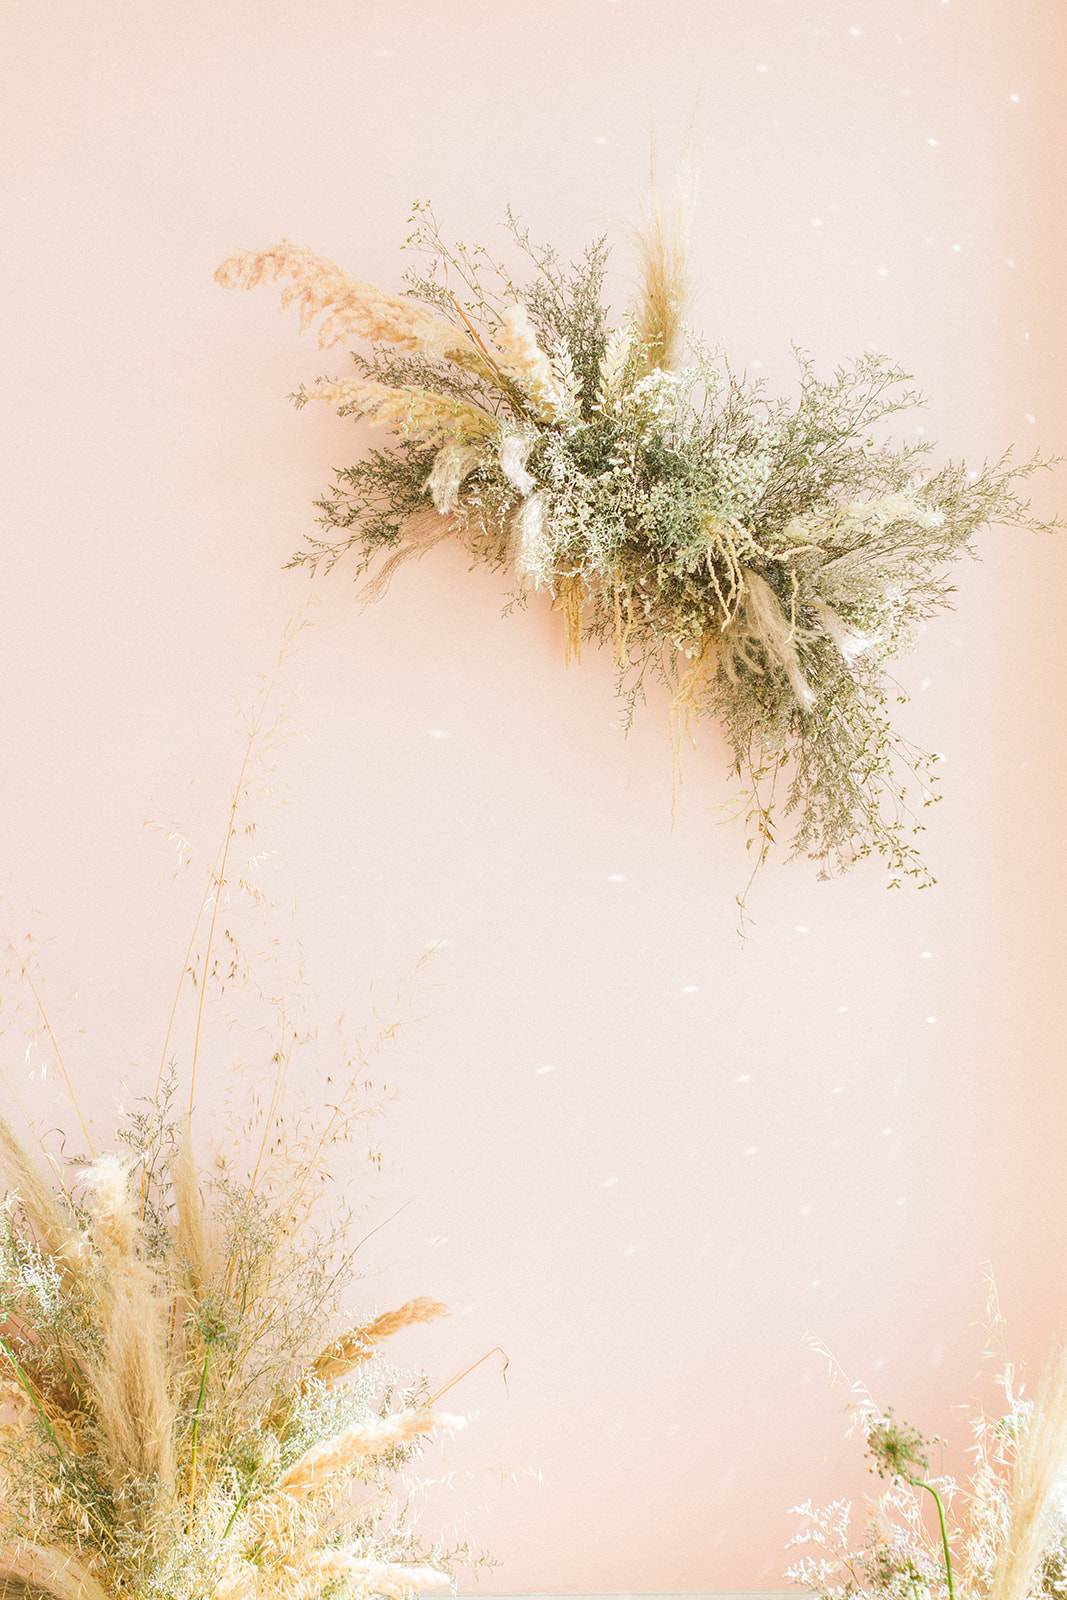 Sarah_Ellefson_Photography-1.jpg